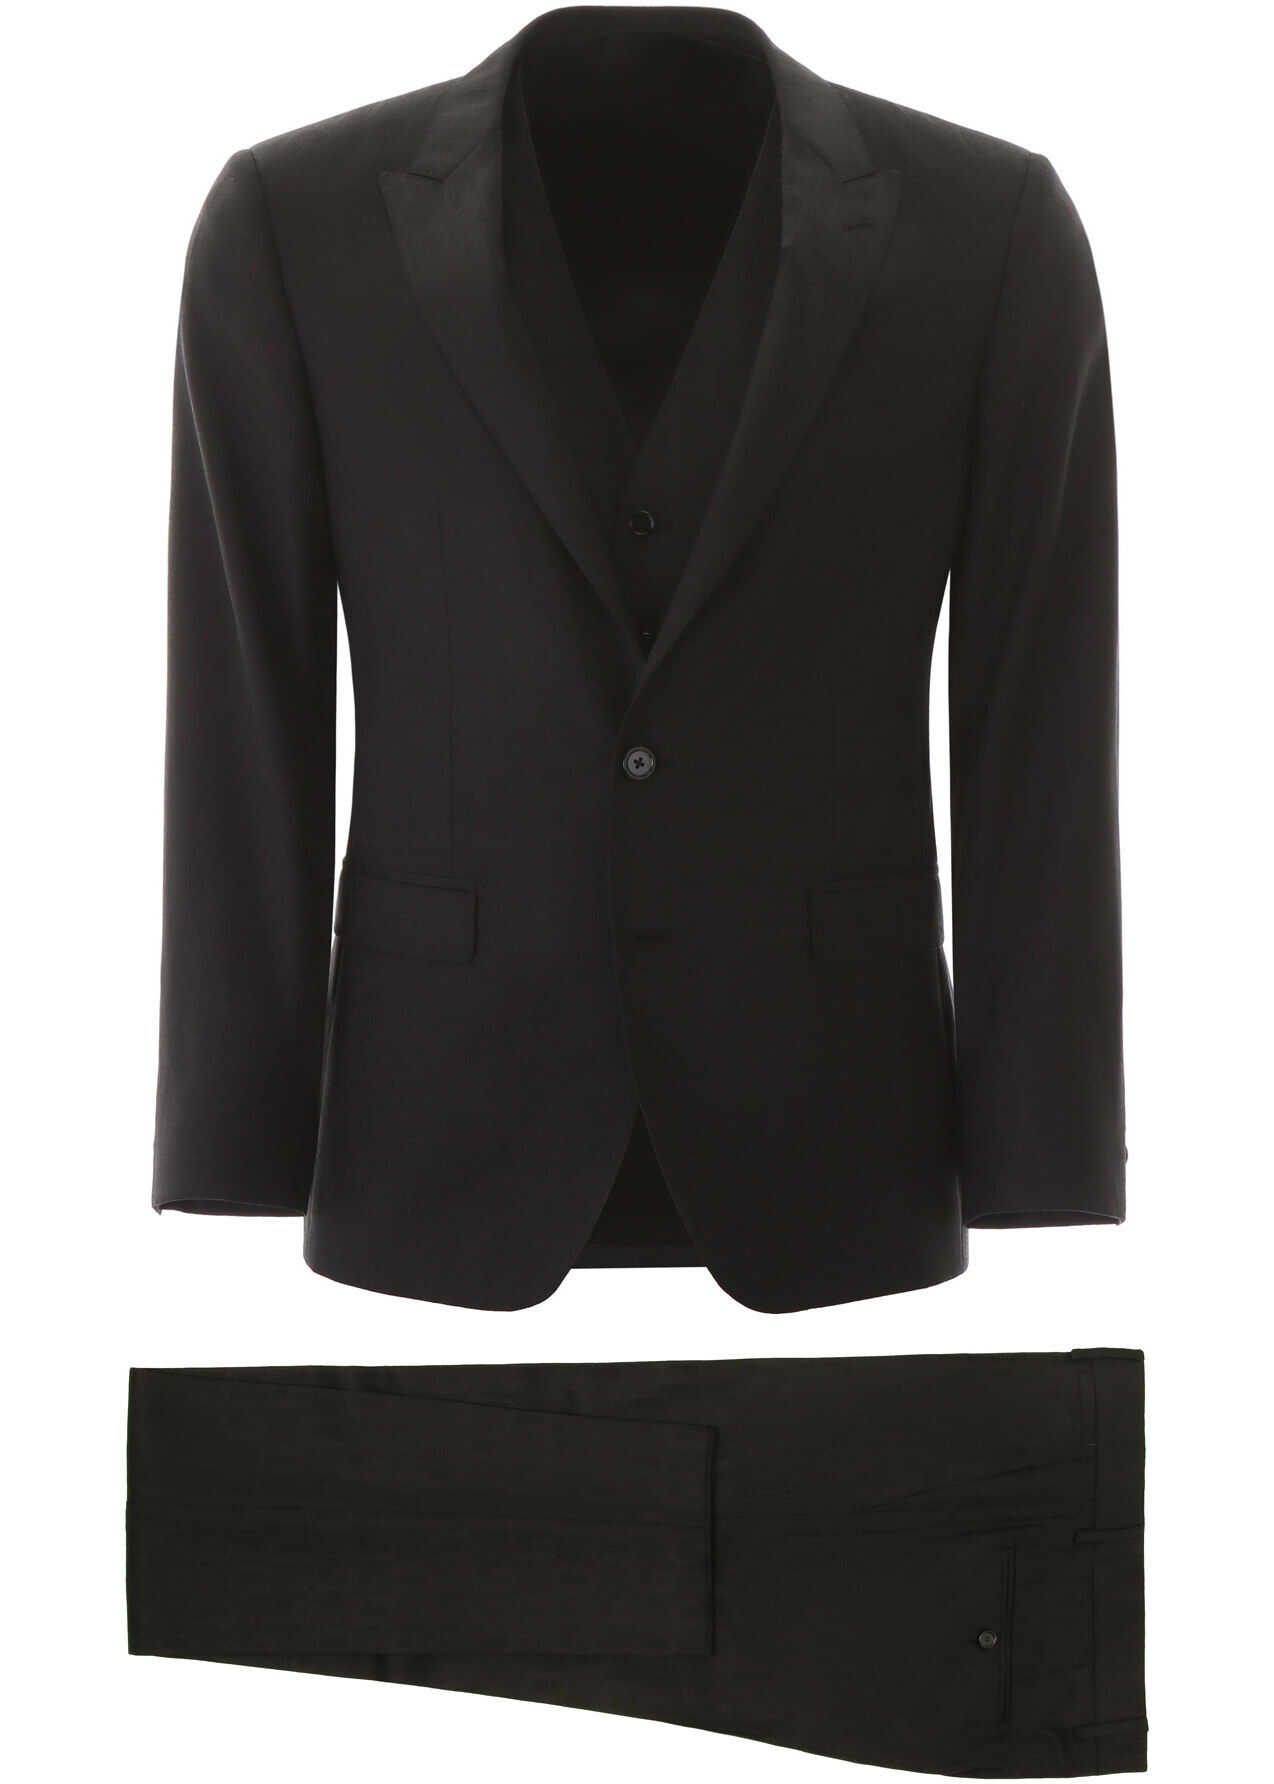 Dolce & Gabbana Dg Jacquard Martini Suit NERO imagine